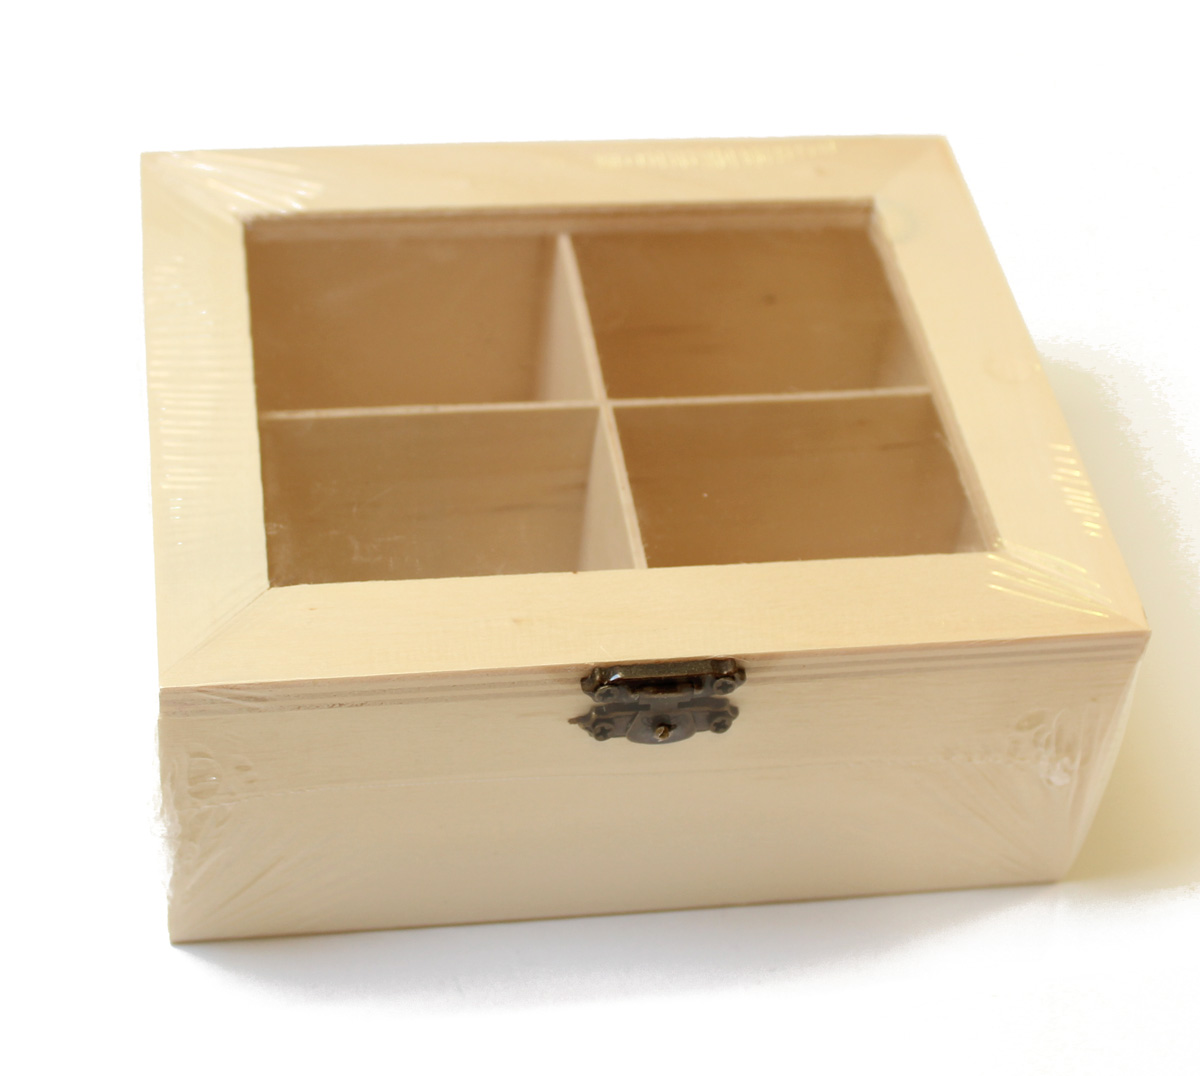 13483542a DECOUPAGE   KREATIVKA   kreatívny materiál, veľkoobchod/maloobchod ...